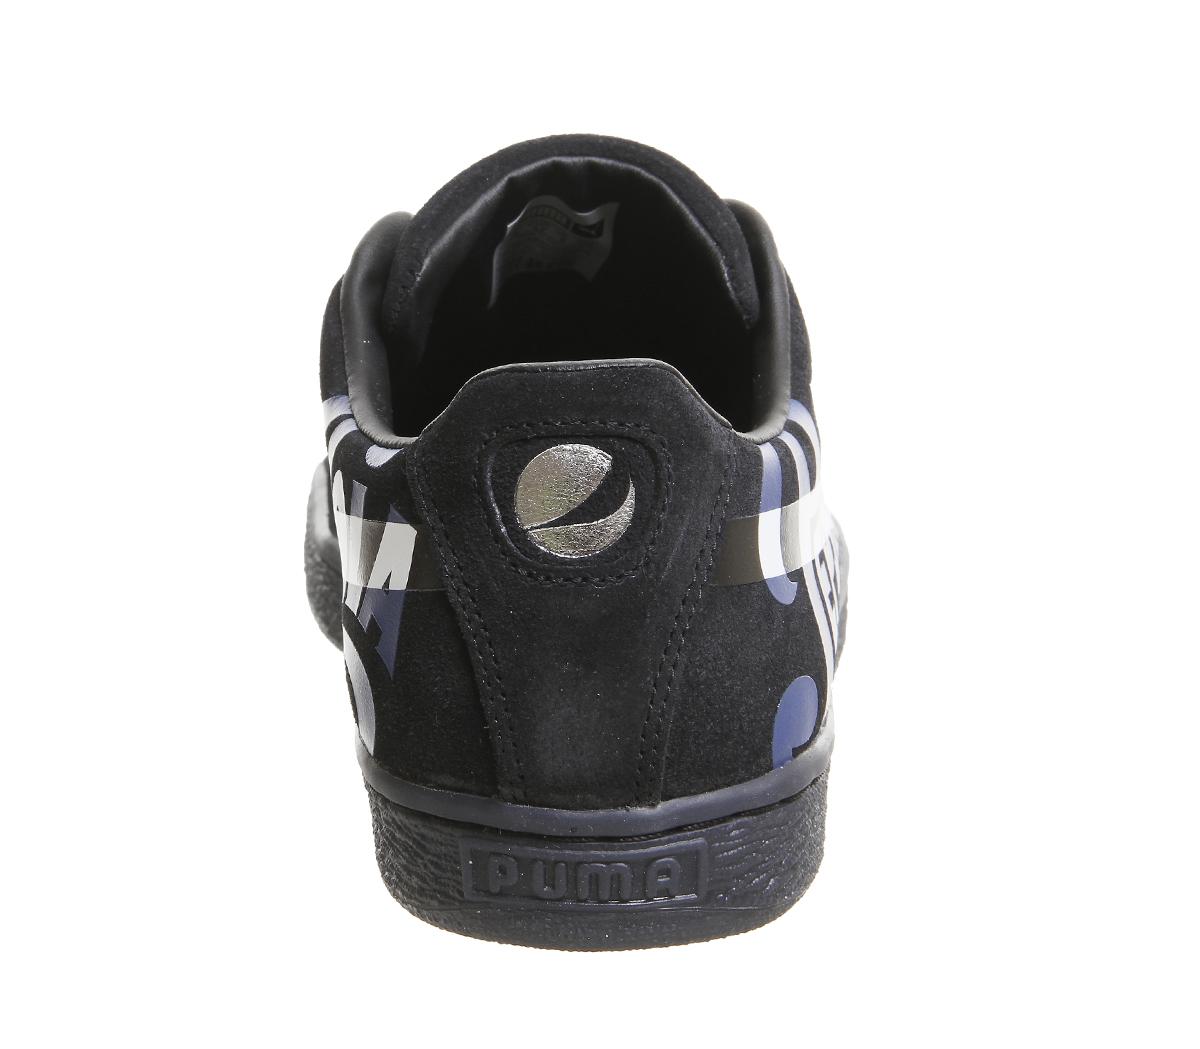 31efd4a4c690f SENTINEL Uomo Puma Suede Classic formatori PEPSI PORT ROYAL allenatori d argento  scarpe